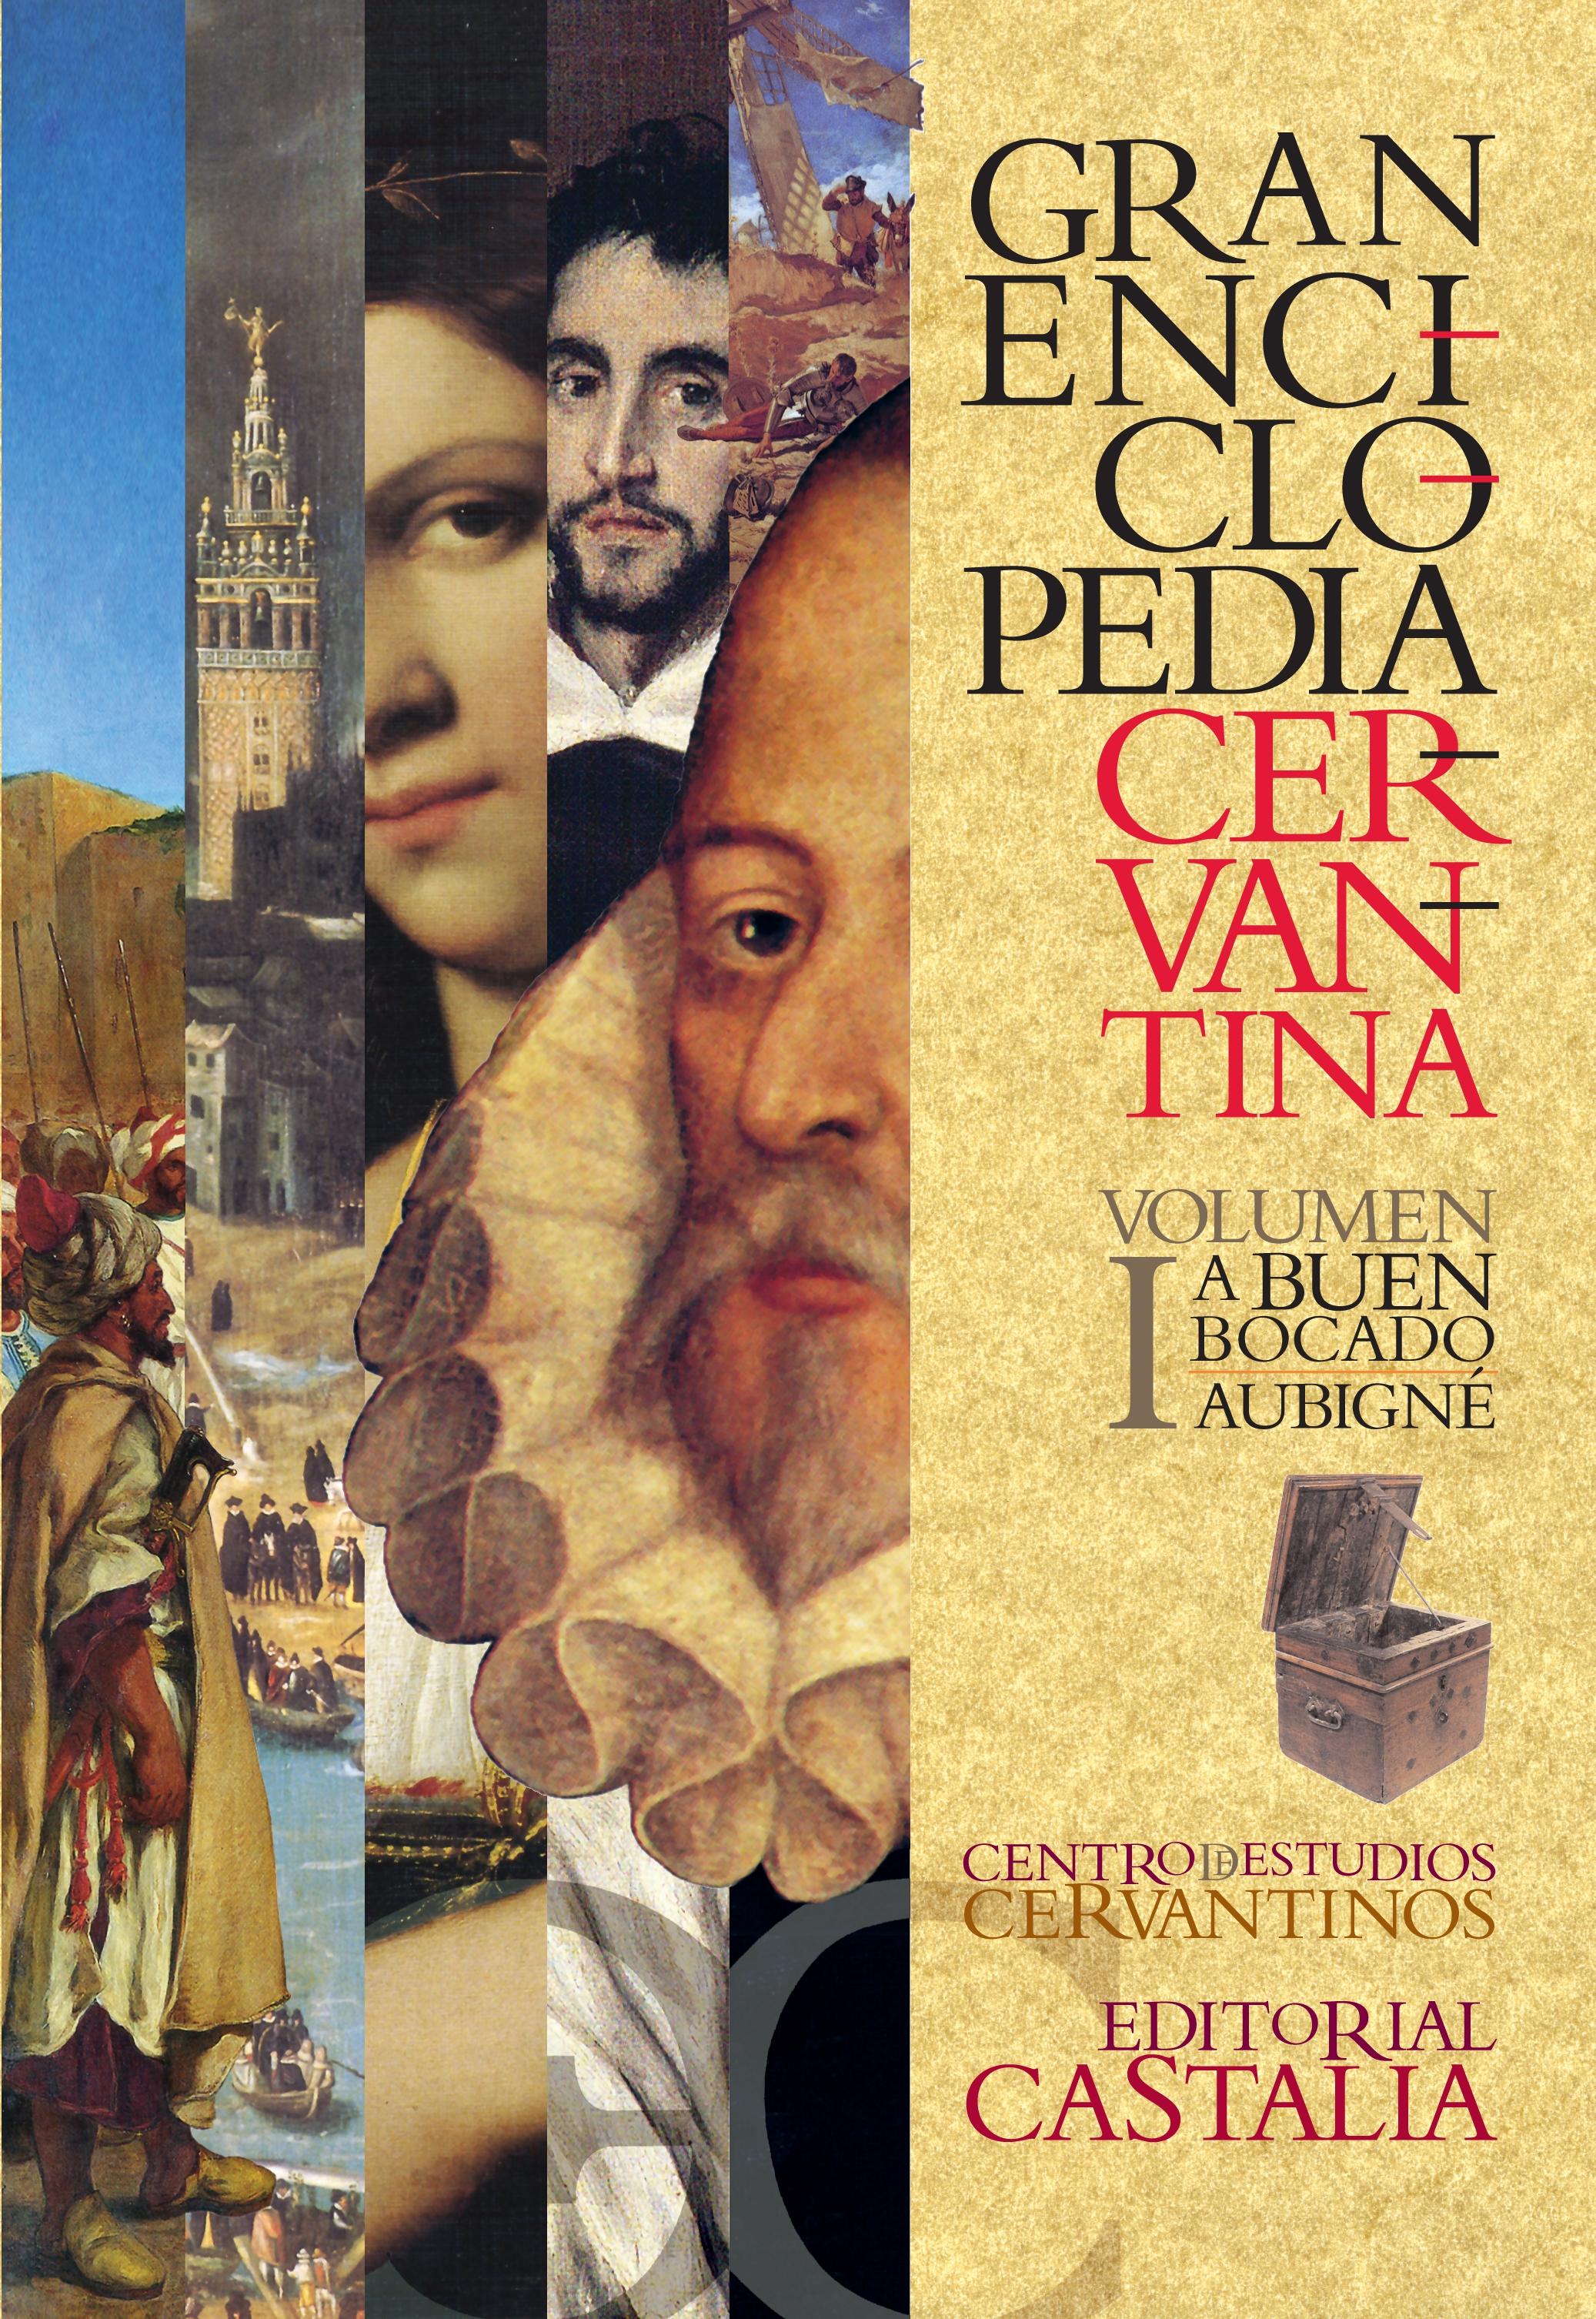 Gran Enciclopedia Cervantina. Volumen I. A buen bocado - Aubigné